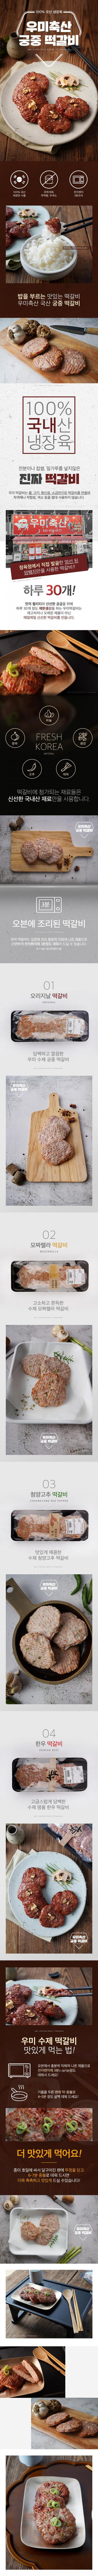 [D136]떡갈비 상세페이지 제작 + 촬영